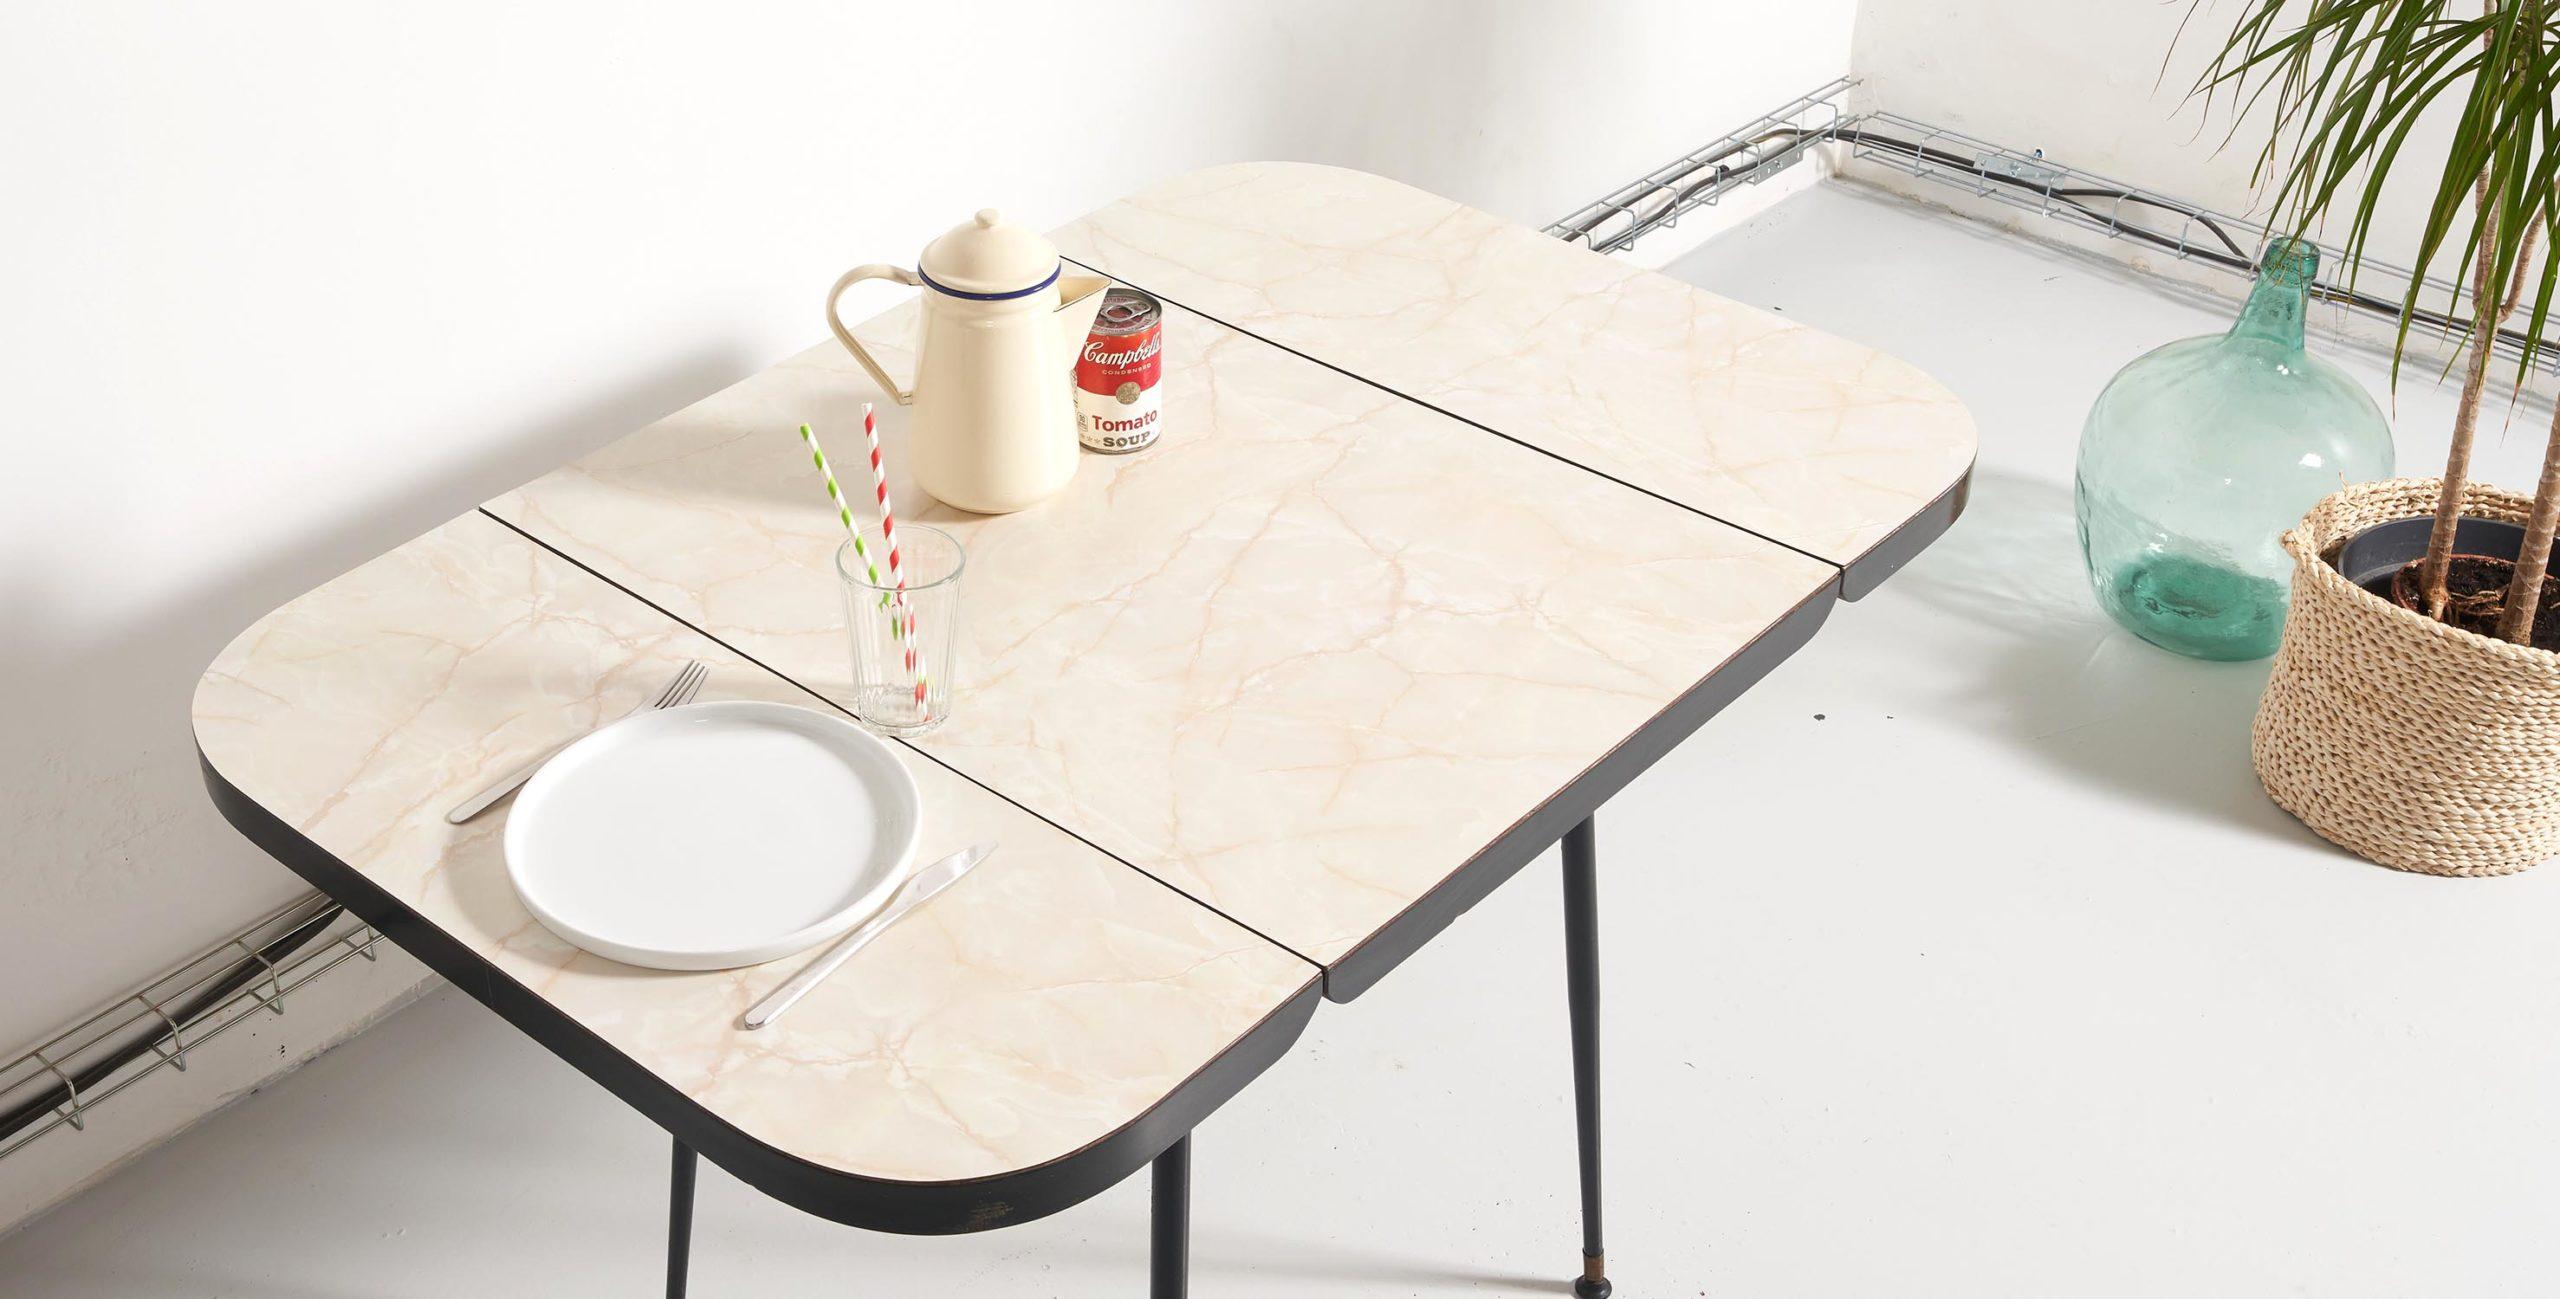 table formica, table vintage, table à manger vintage, table à manger formica, table à manger formica vintage, table pieds compas, table métal, table métal et formica, table formica beige, table vintage